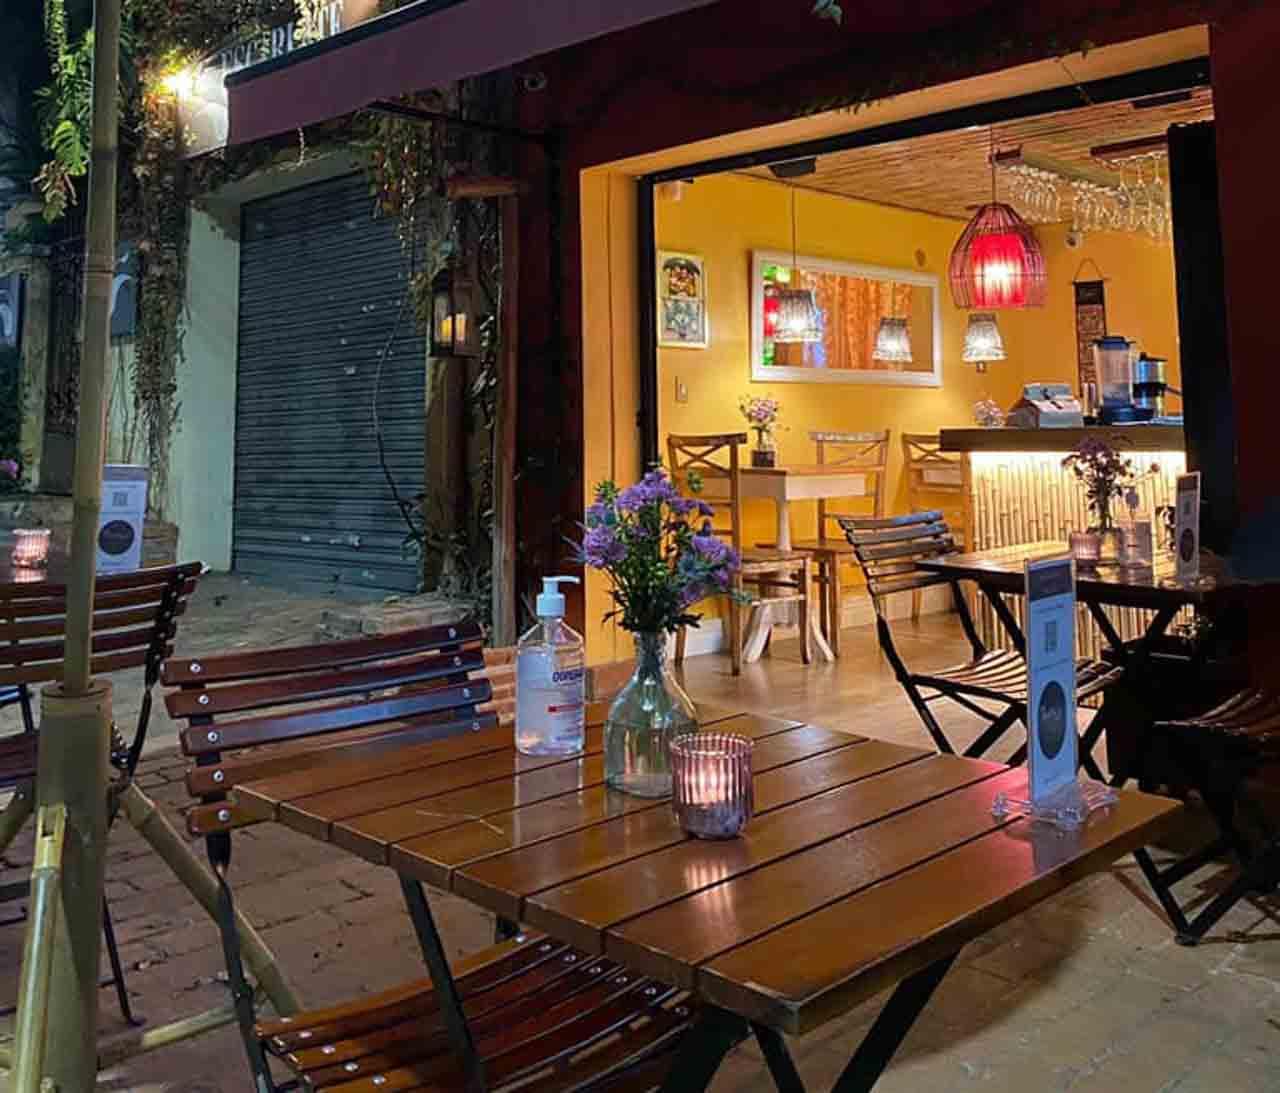 Entrada do ThaiThai Brasil, restaurante tailandês em SP, Brasil.